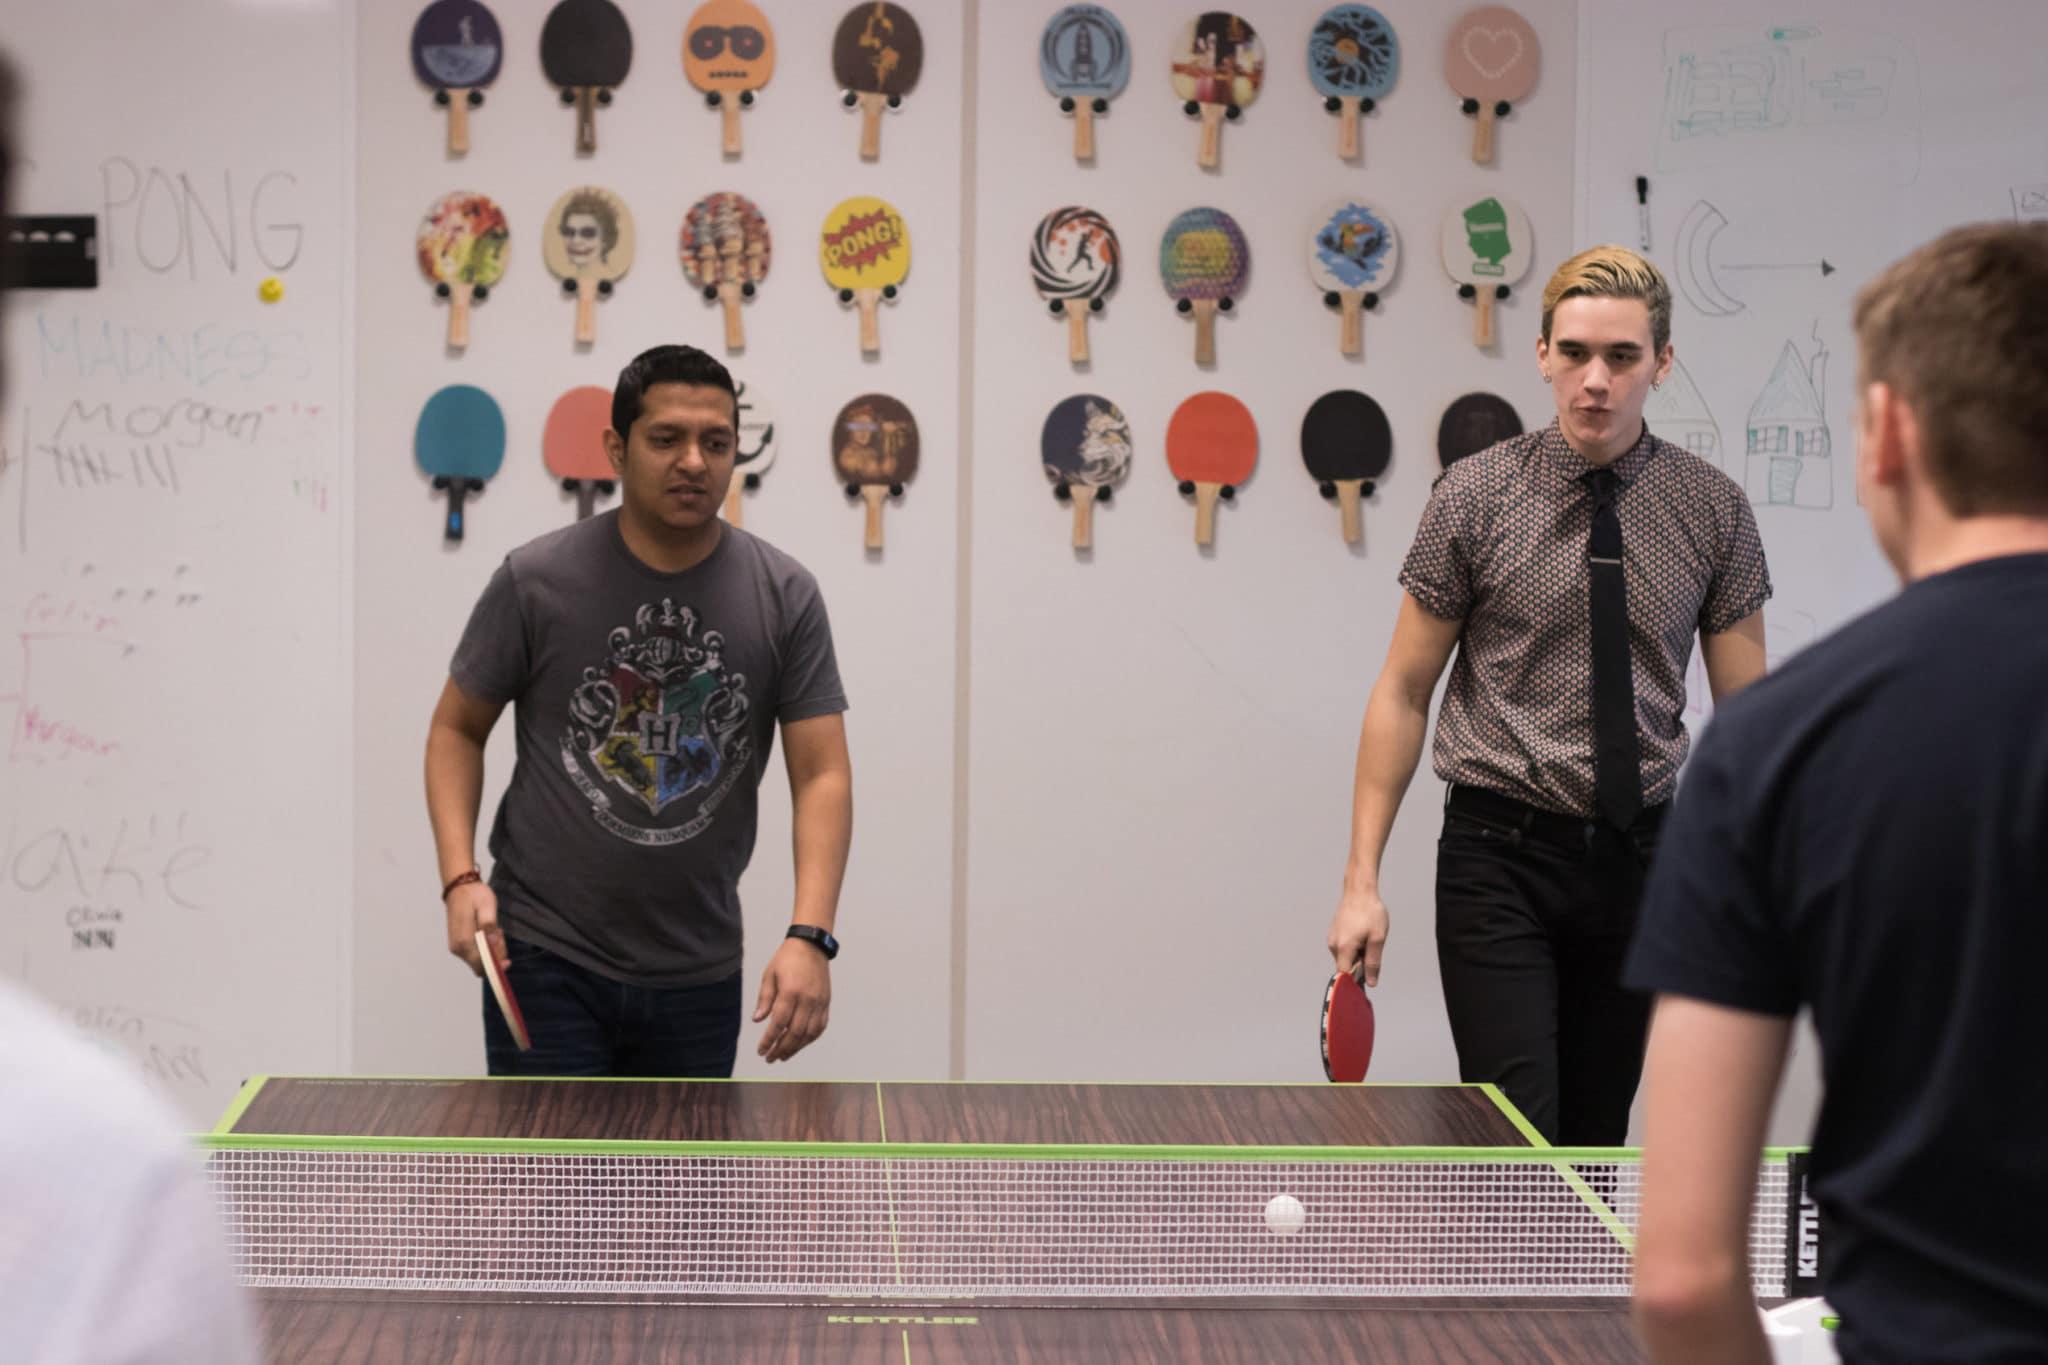 PI ping pong players